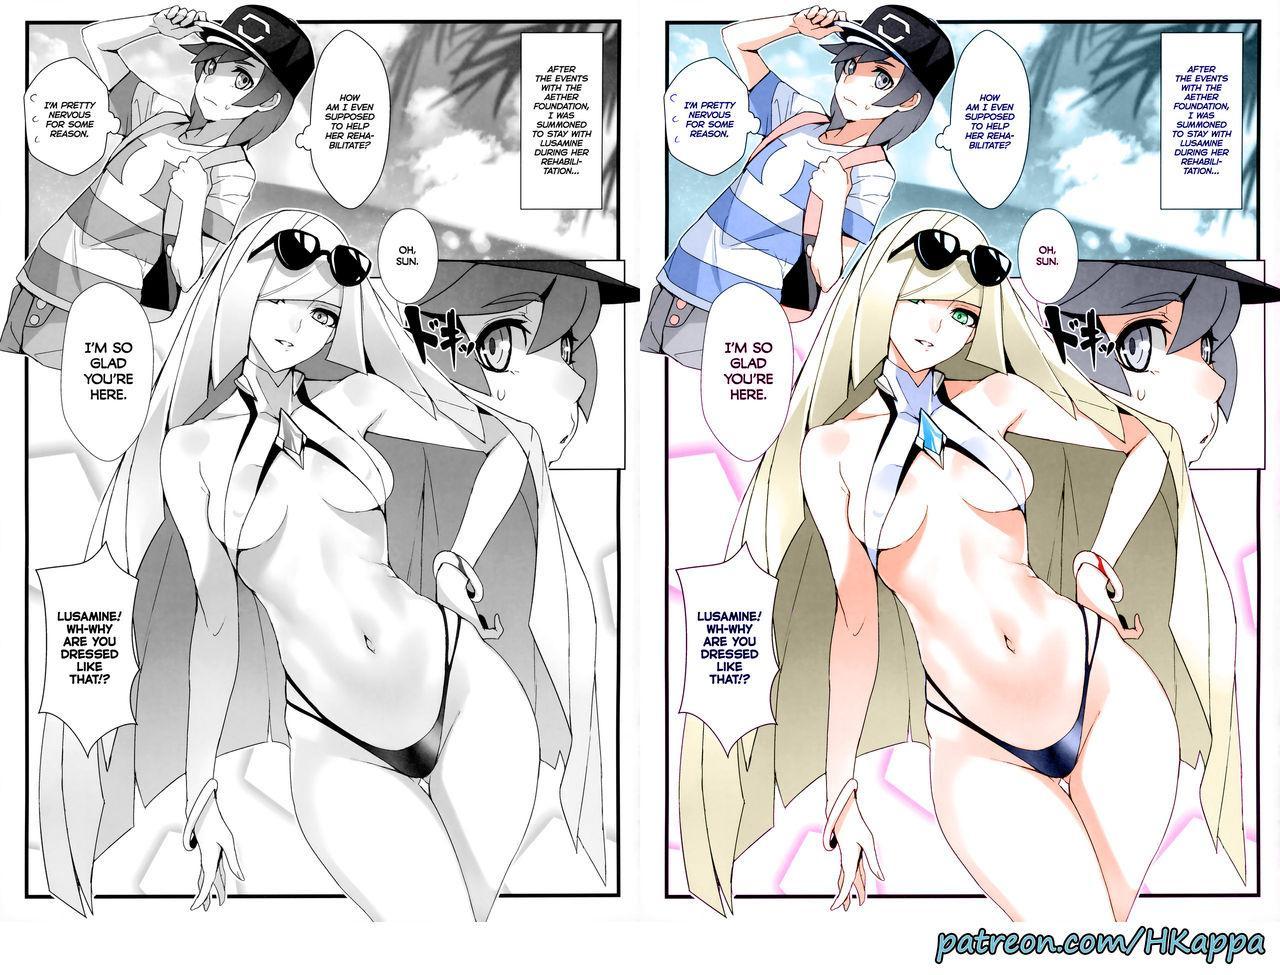 [Patreon] HKappa: Venus Infection - Ban! - Pokemon English Full Color 7